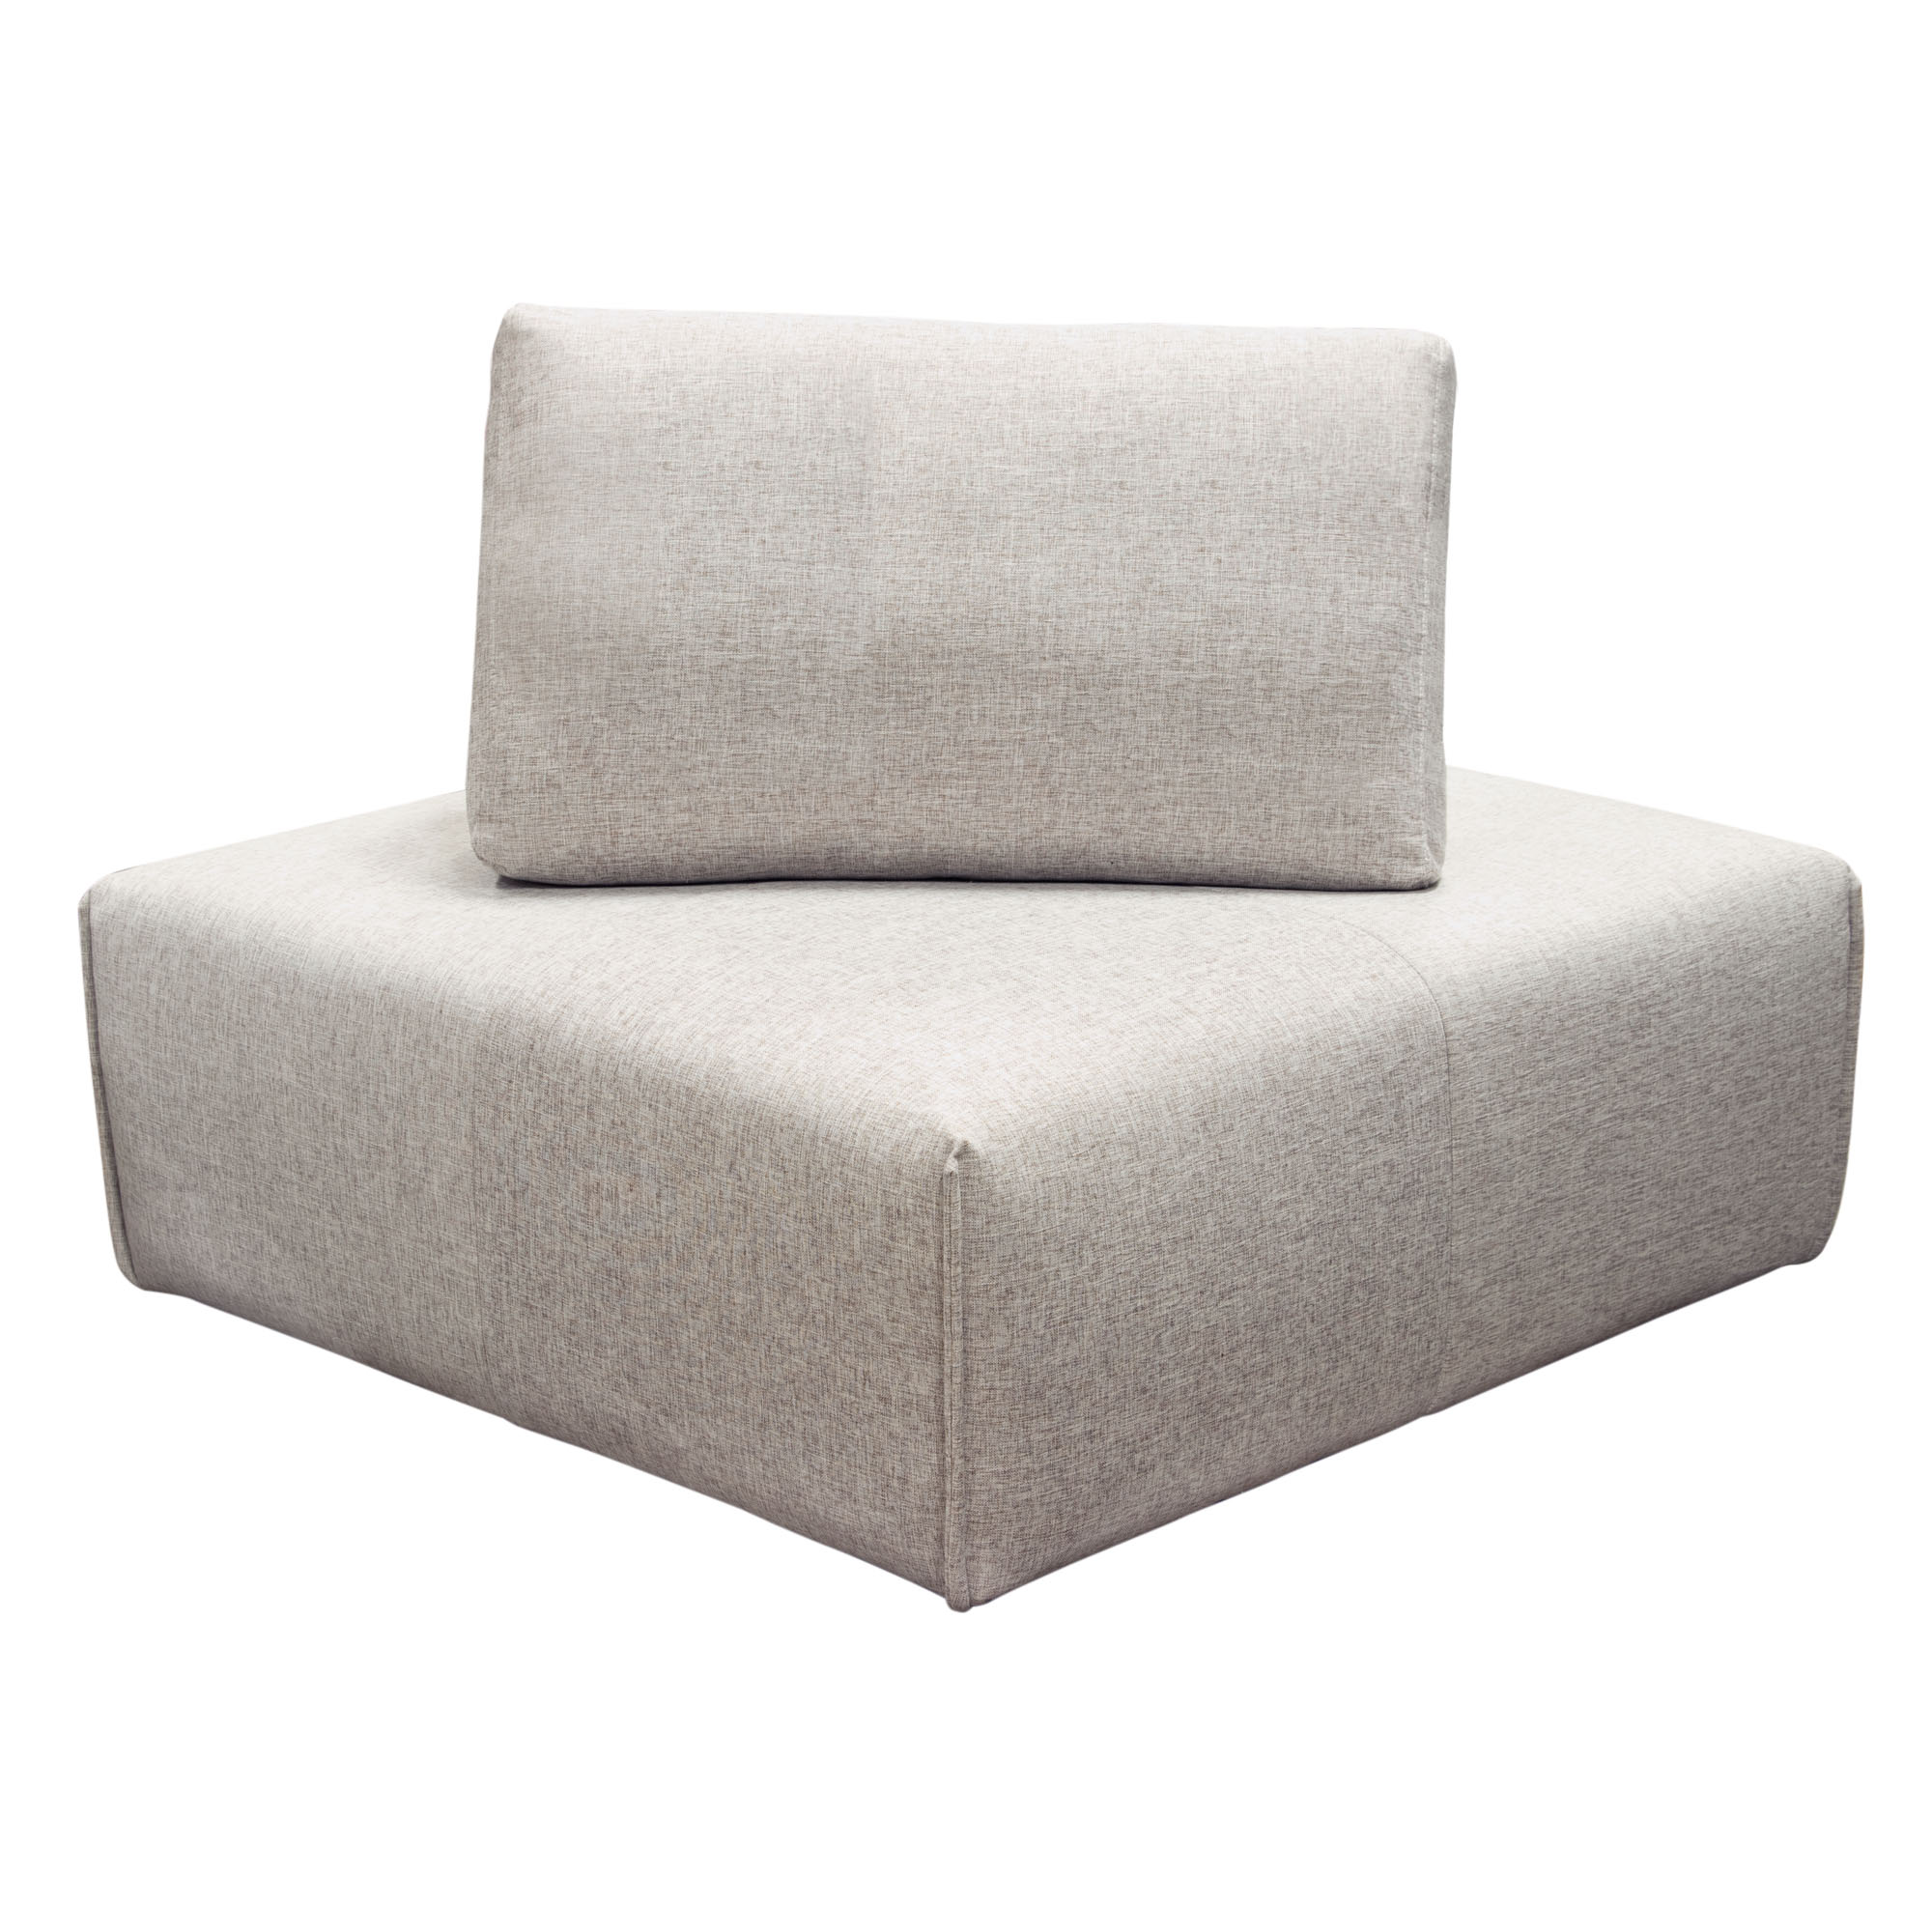 Square Corner  43 X 43 X 32 Adjustable backrest for dual seat depth. Interlocking system.